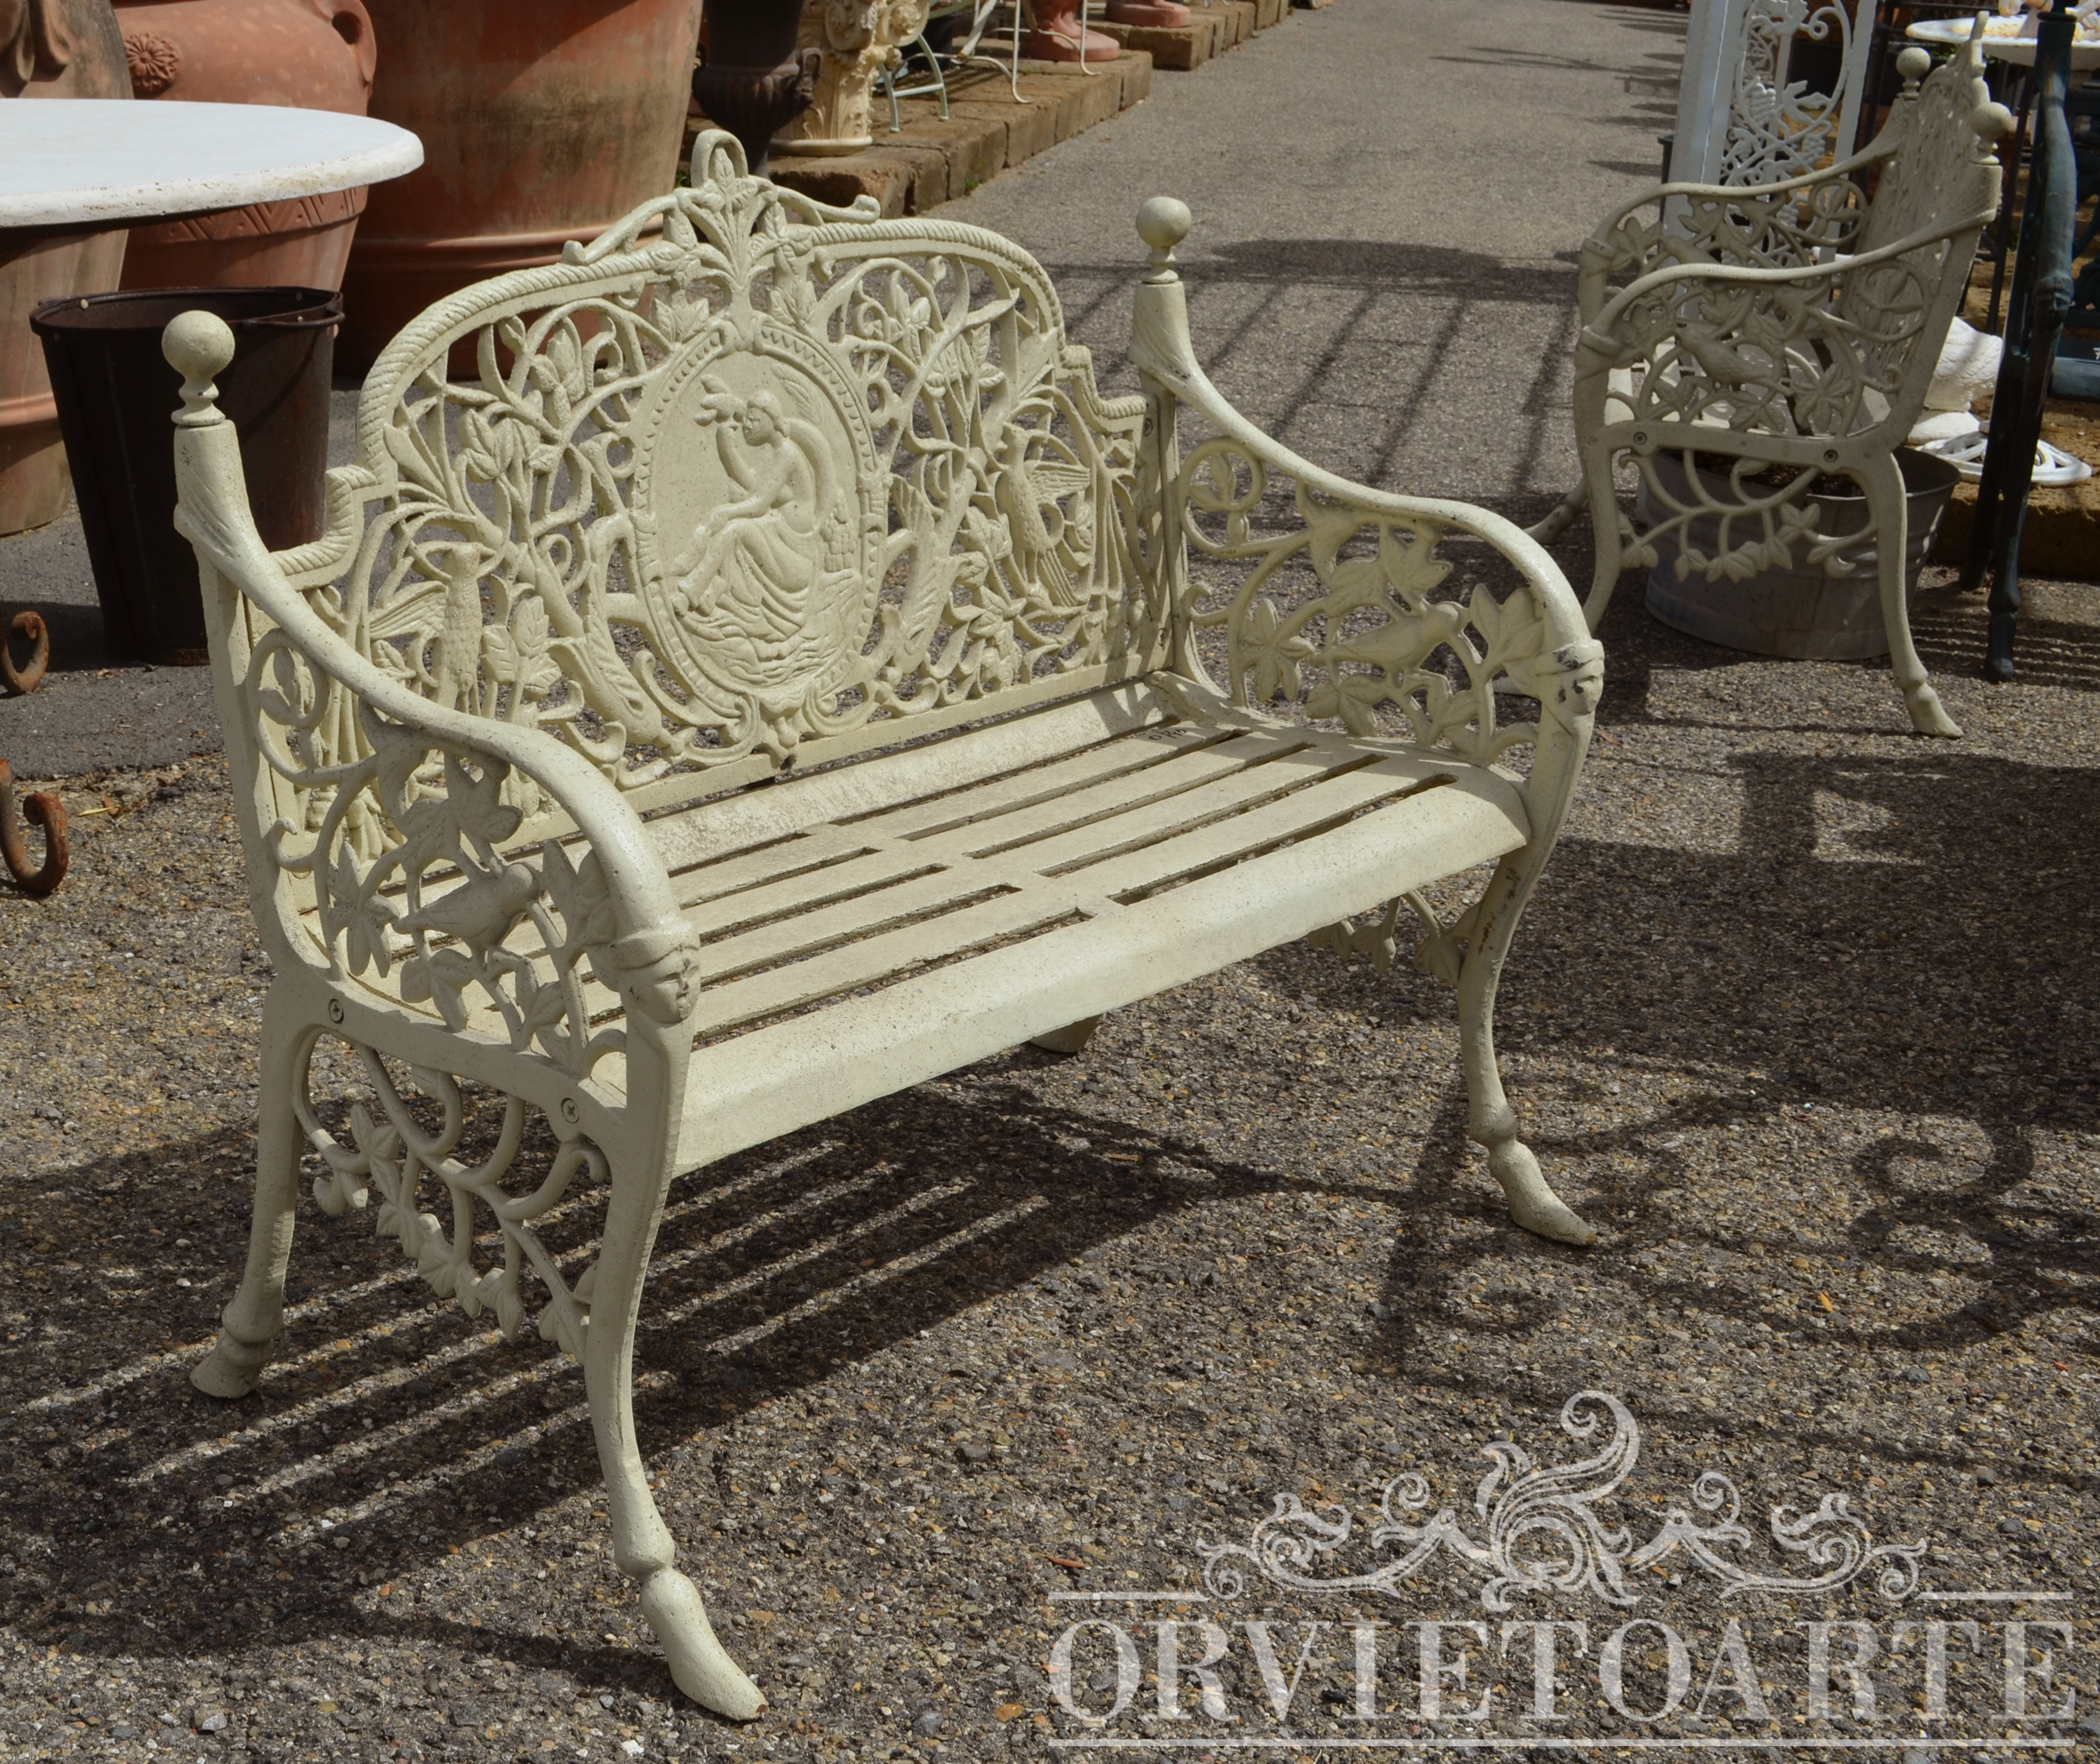 Orvieto arte panchina in ghisa due posti con medaglione for Arredo giardino perugia